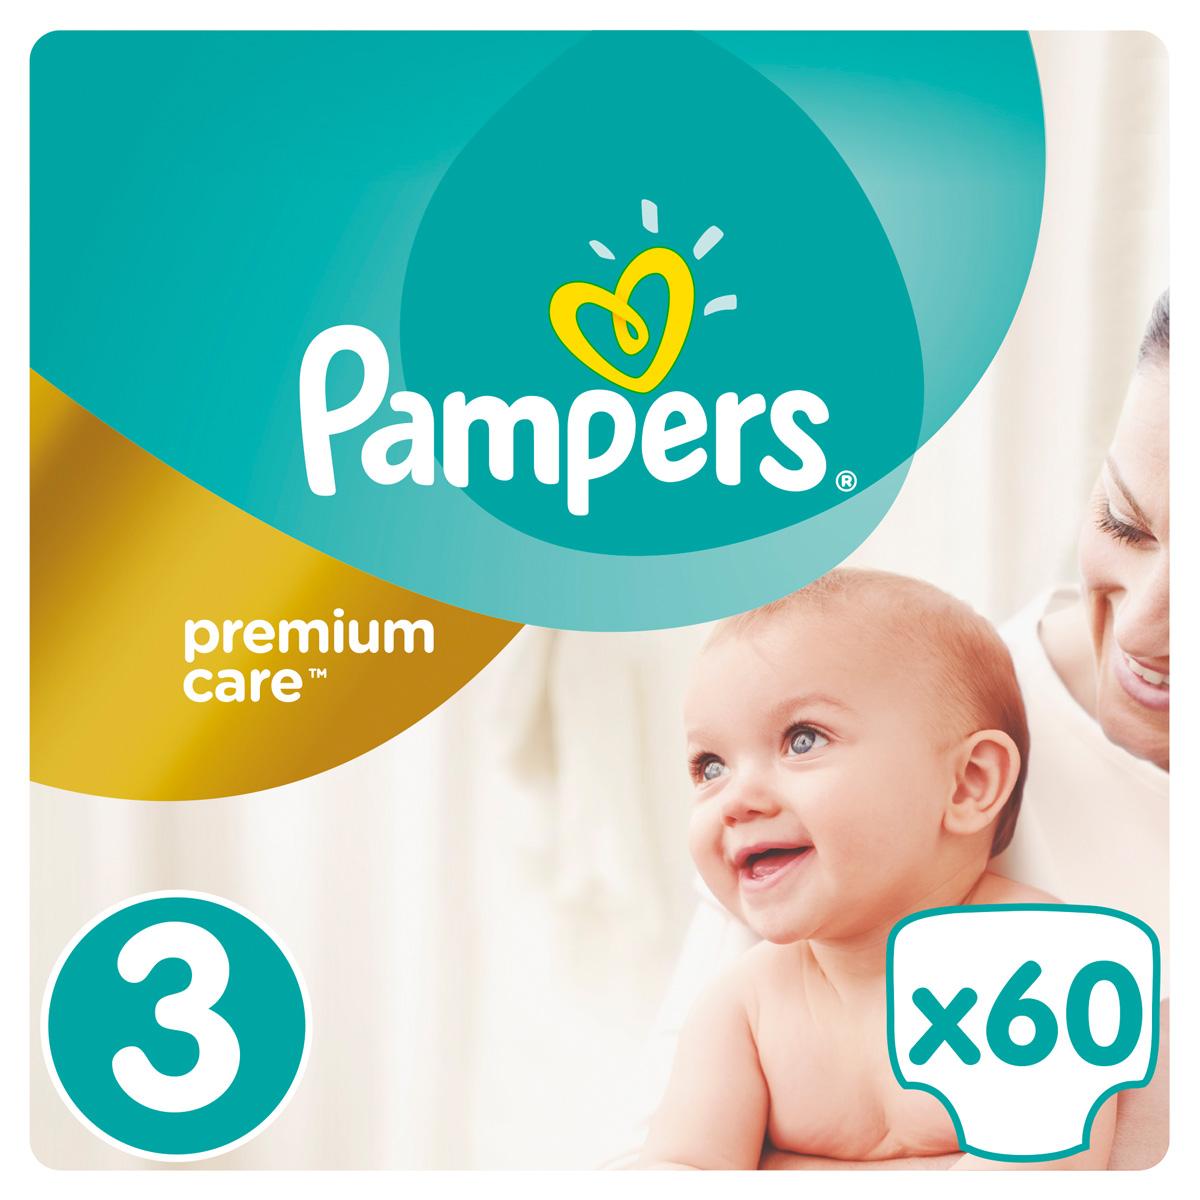 Pampers Premium Care Подгузники 3, 5-9 кг, 60 шт подгузники детские pampers подгузники pampers premium care 2 5 кг 1 размер 88 шт